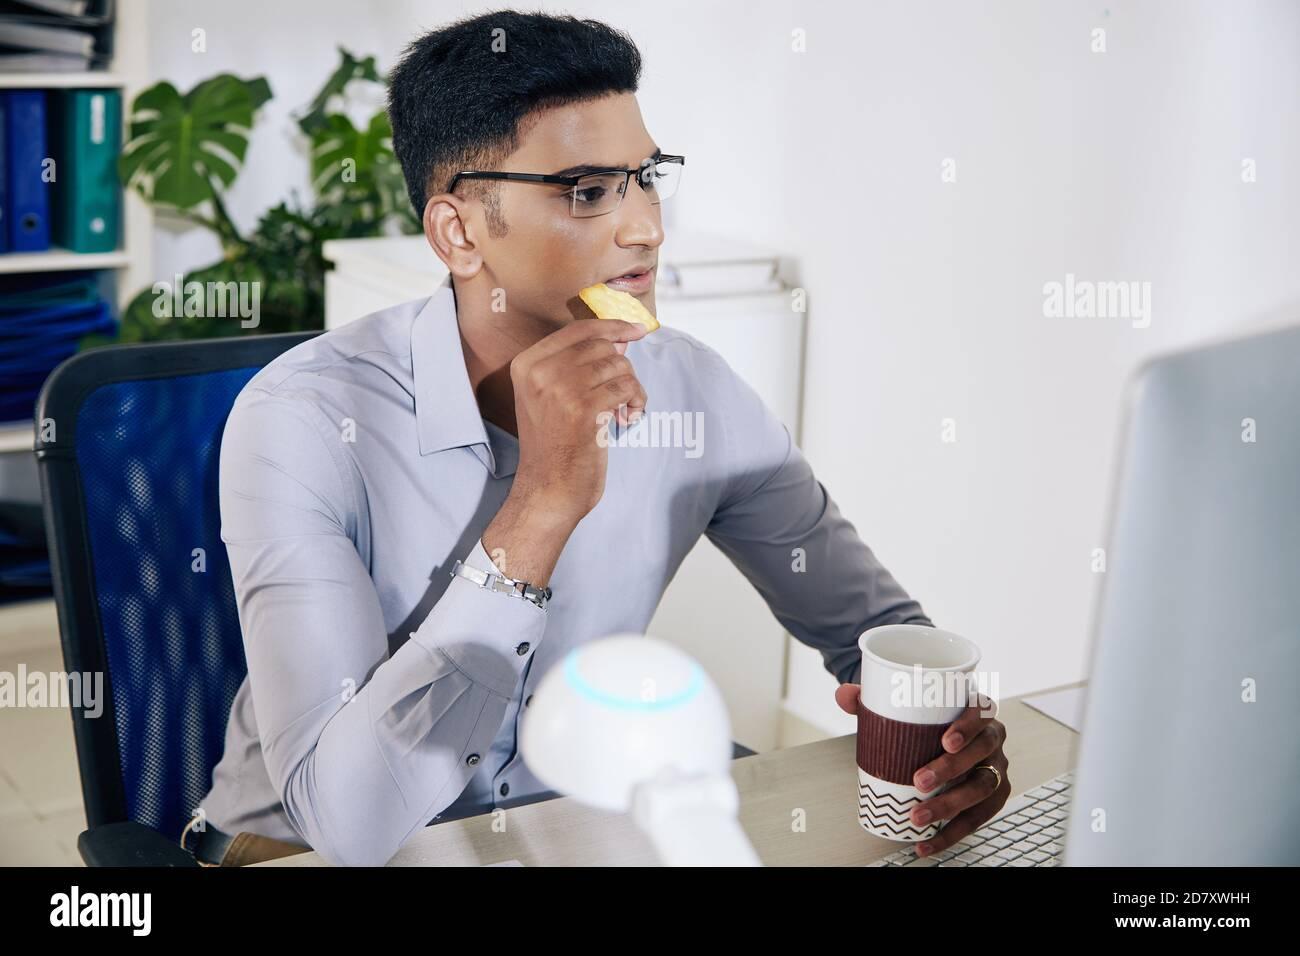 Software-Entwickler trinkt Kaffee Stockfoto